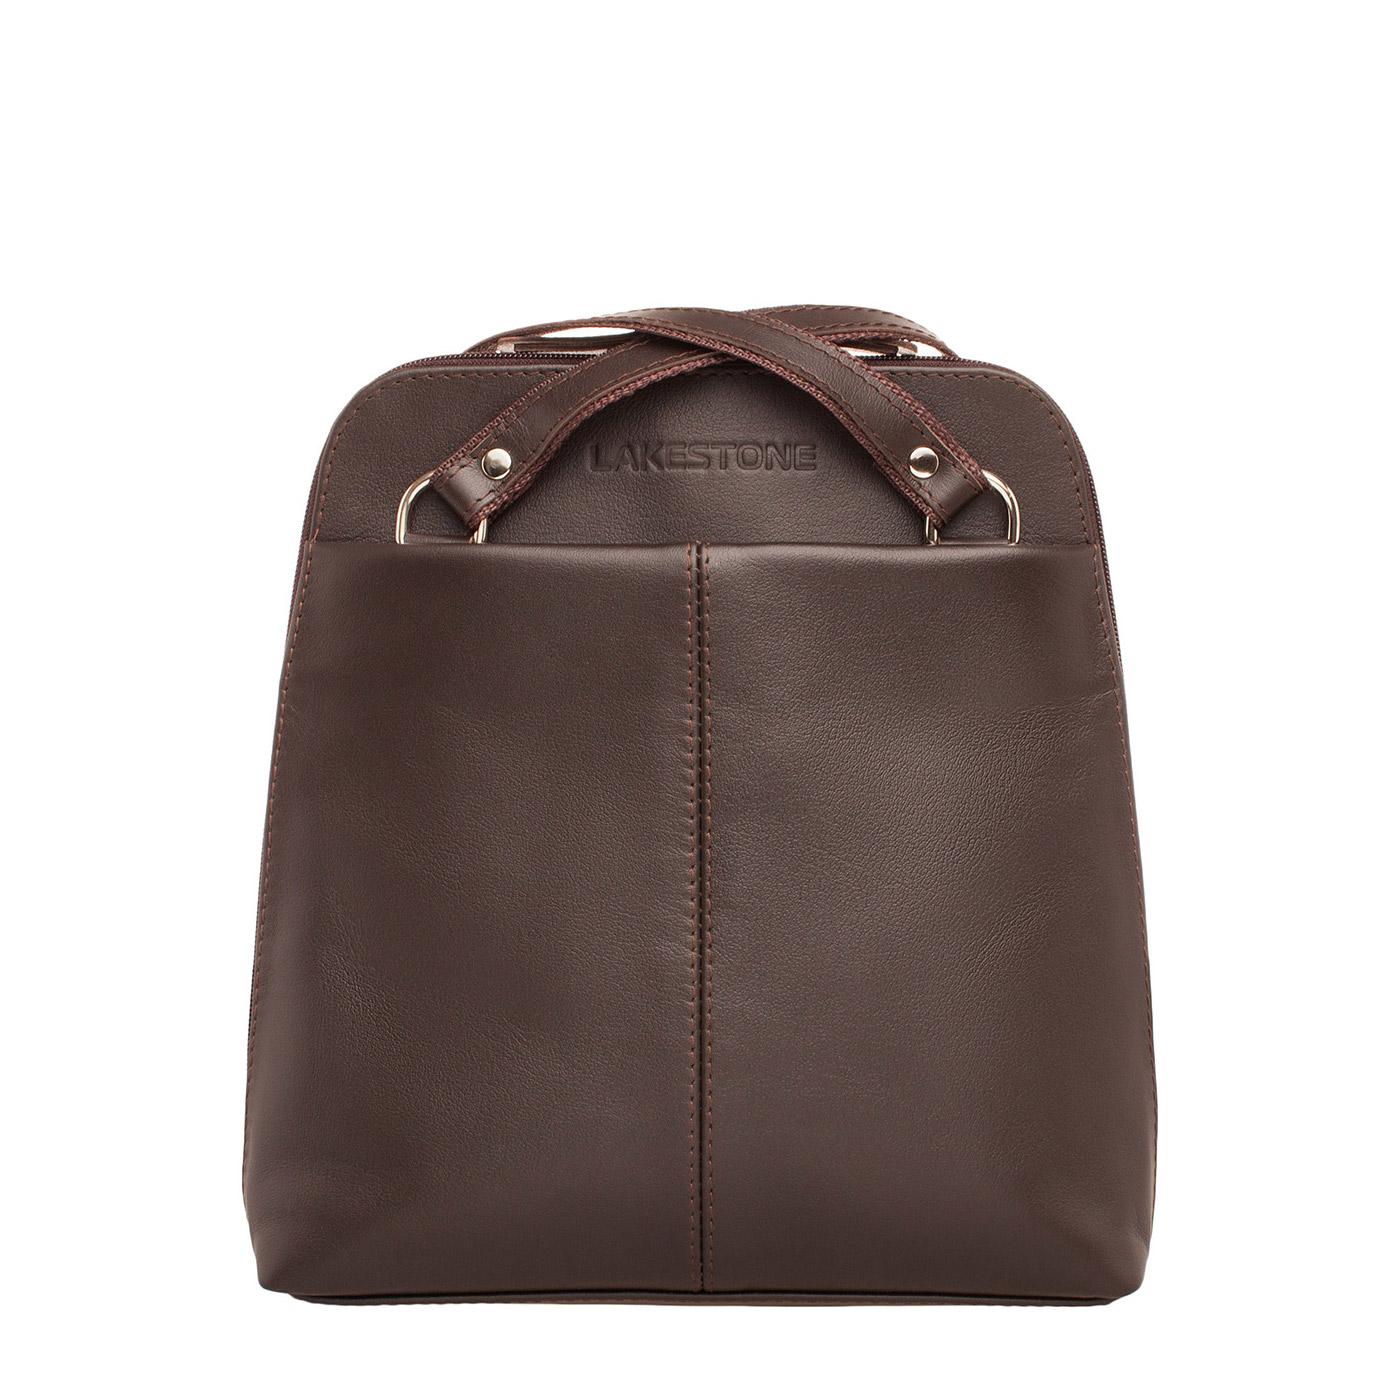 Рюкзак женский кожаный Lakestone 918103/BR фото